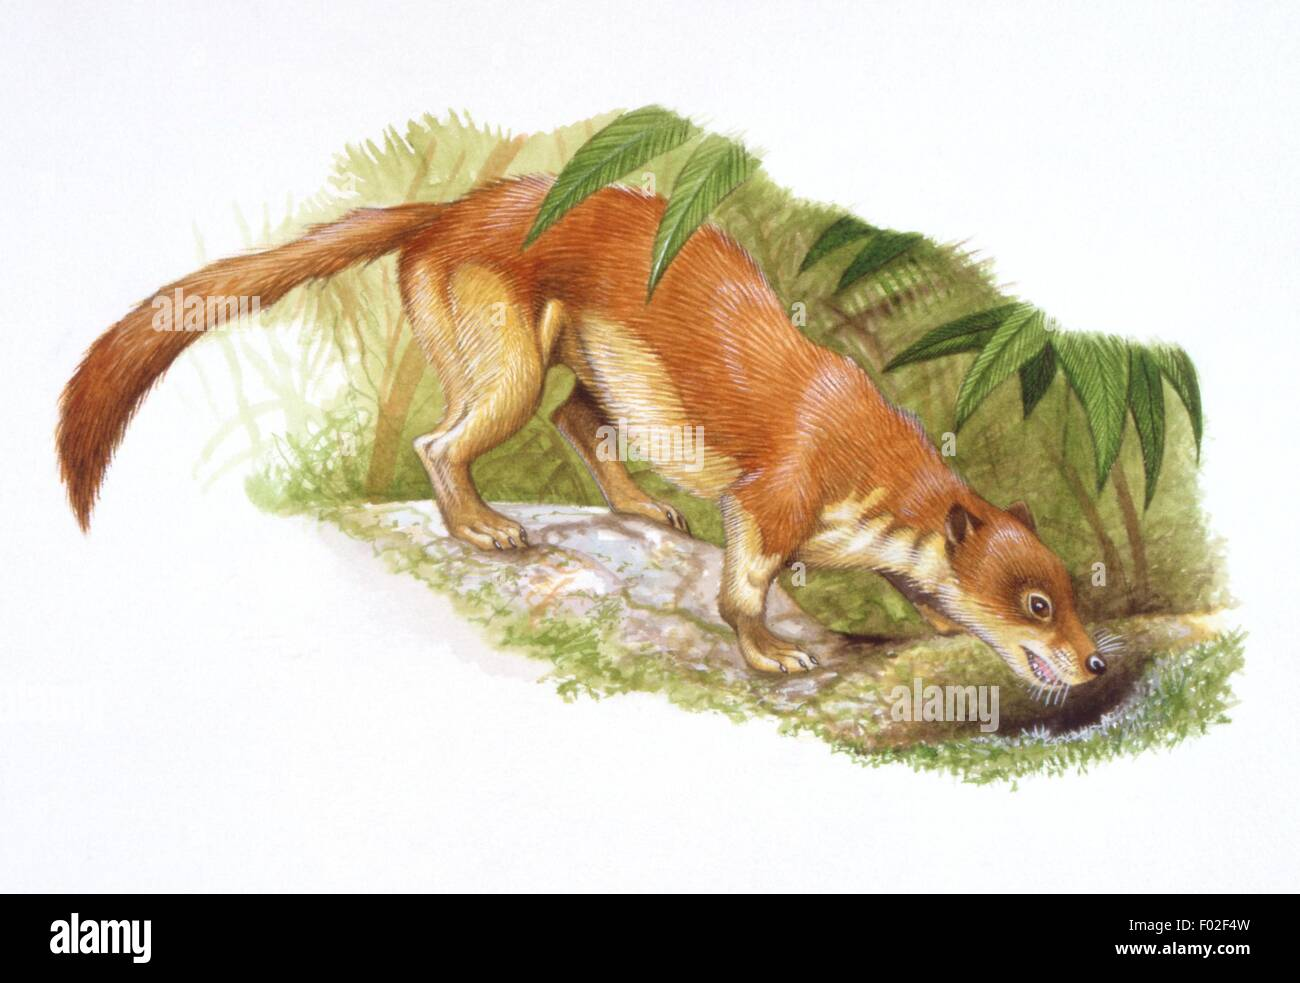 Palaeozoology - Miocene/Pliocene period - Extinct mammals - Ictitherium (Hyaenidae) - Art work by Steve Roberts - Stock Image